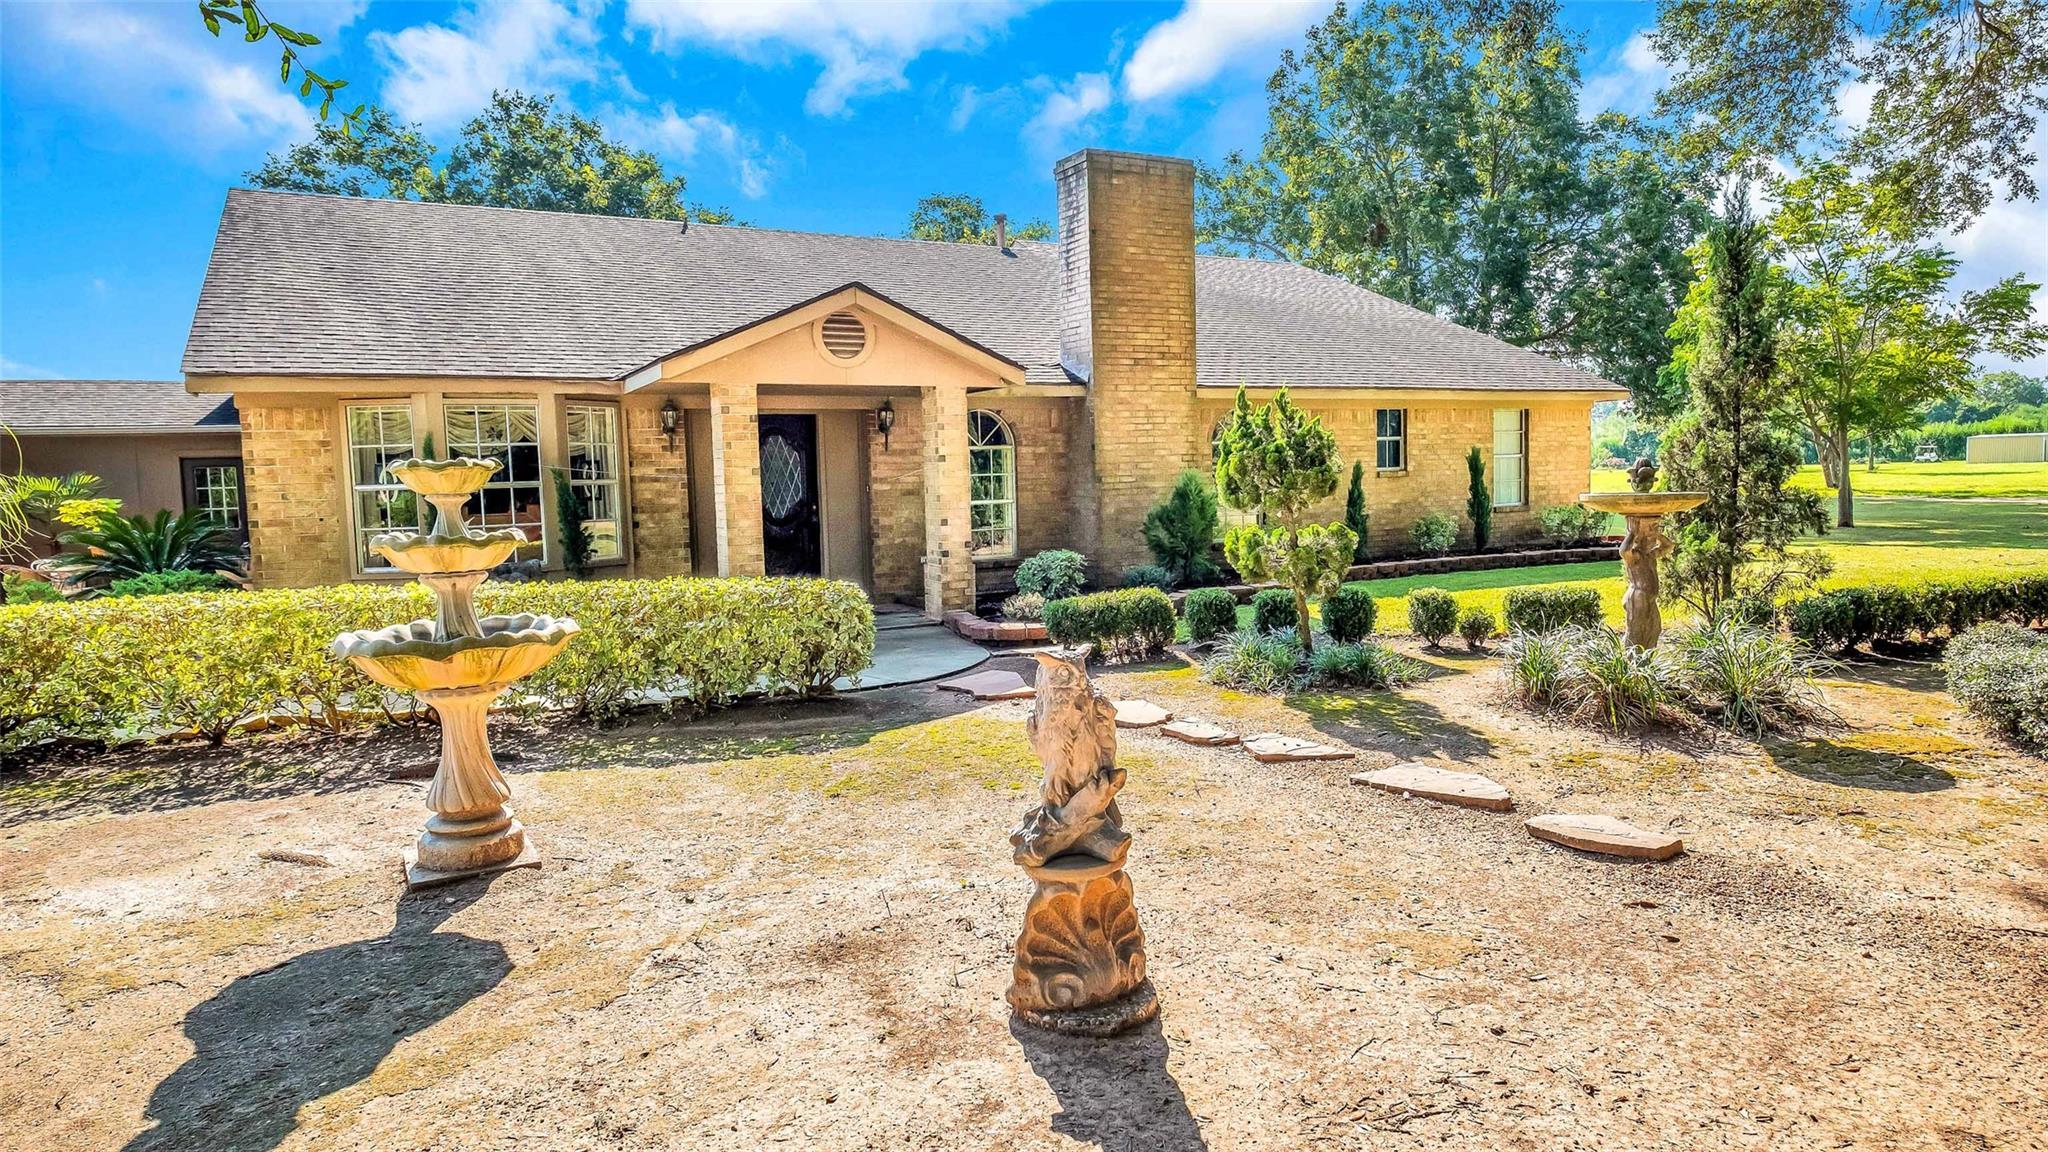 10125 Fm 1489 Road Property Photo - Wallis, TX real estate listing